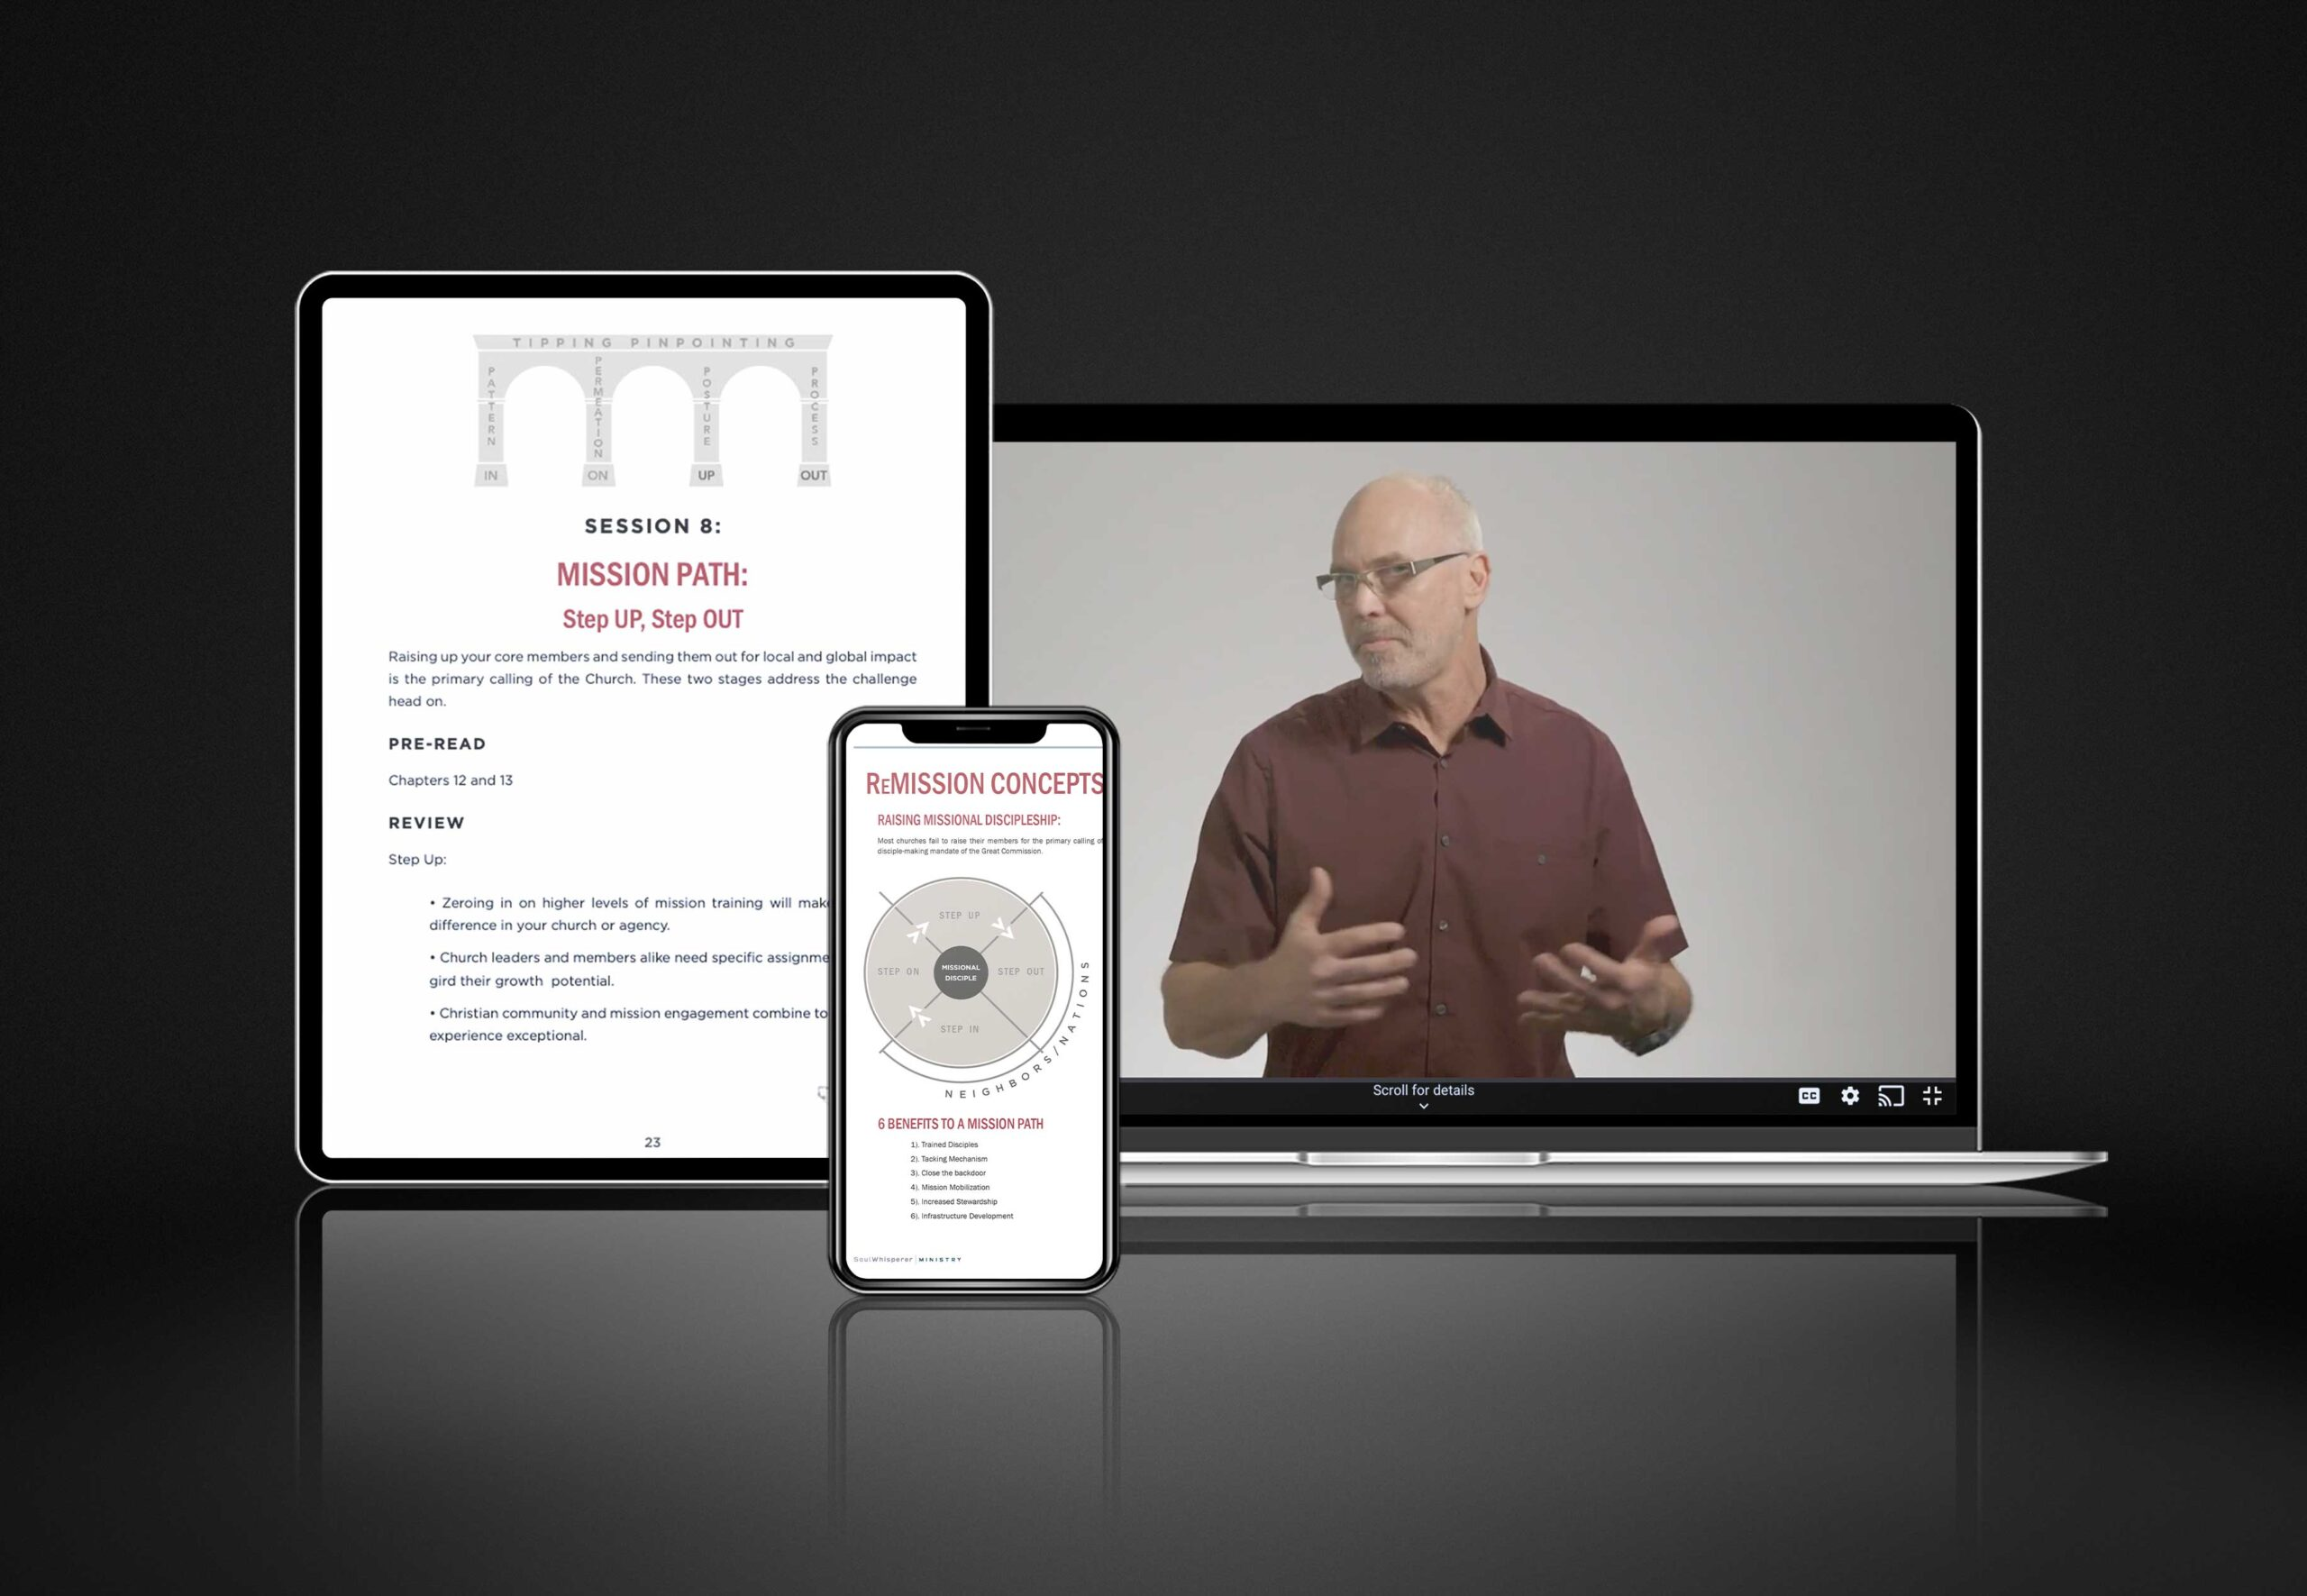 ReMission-Video-Training